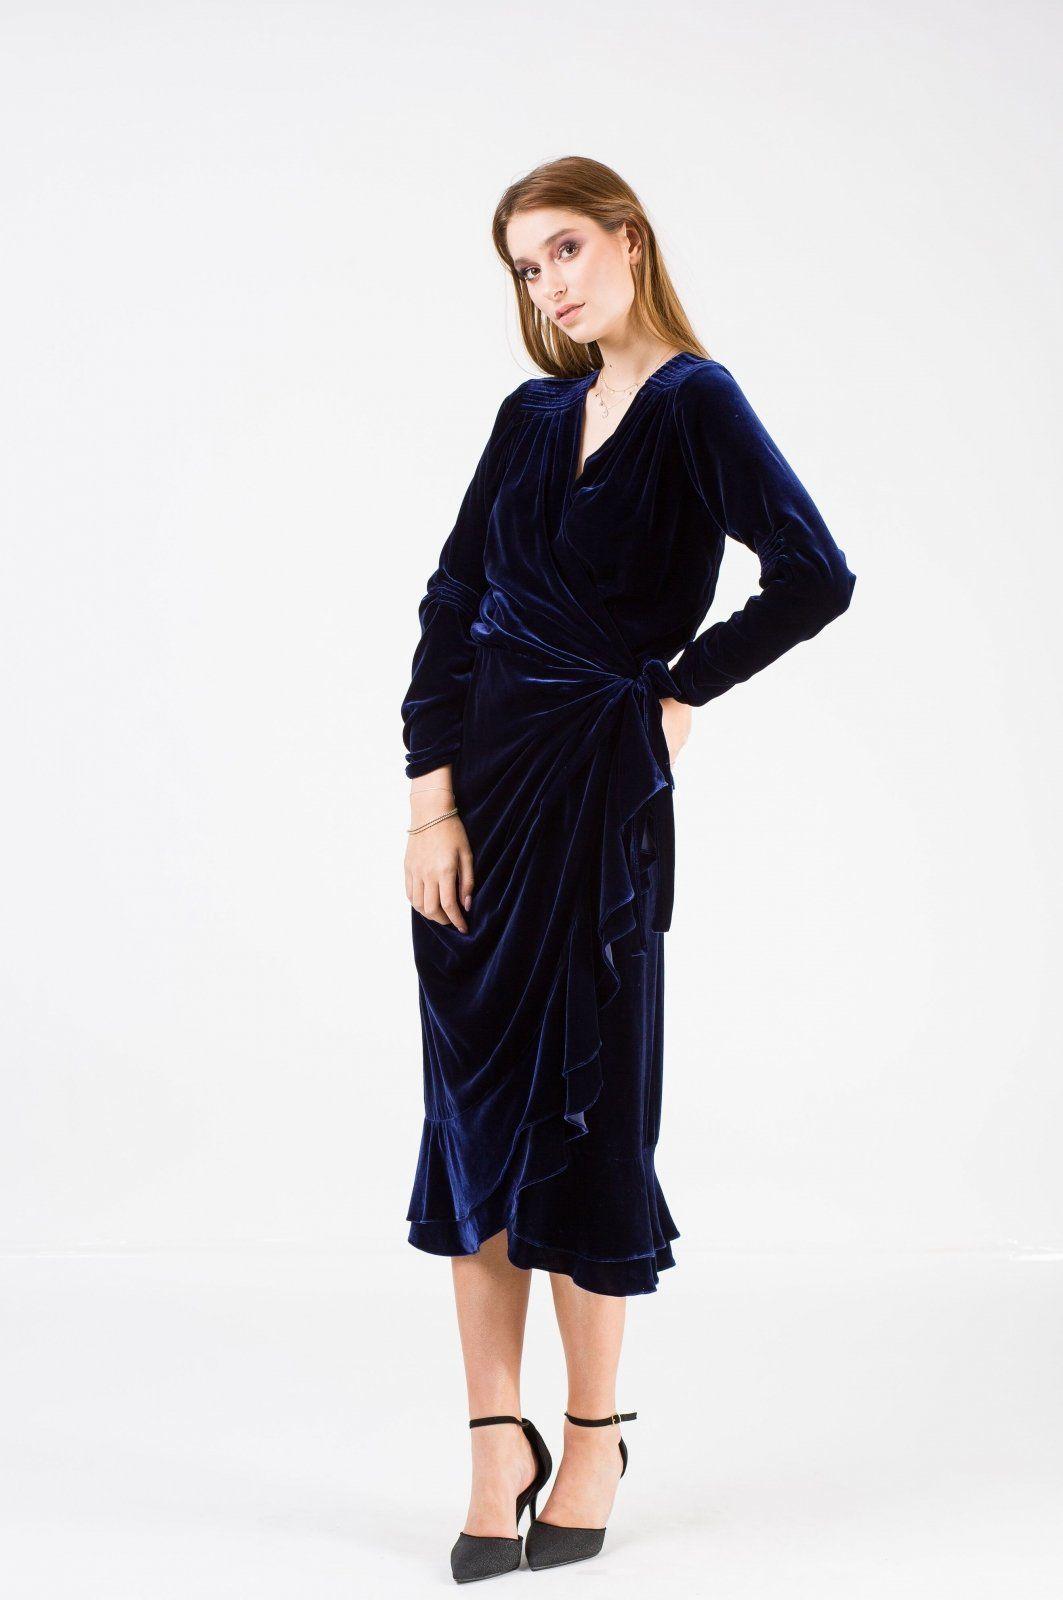 Sukienka Velvet Wrap Welurowa Granatowa Aksamit E Garderobe Long Sleeve Dress Dresses Fashion